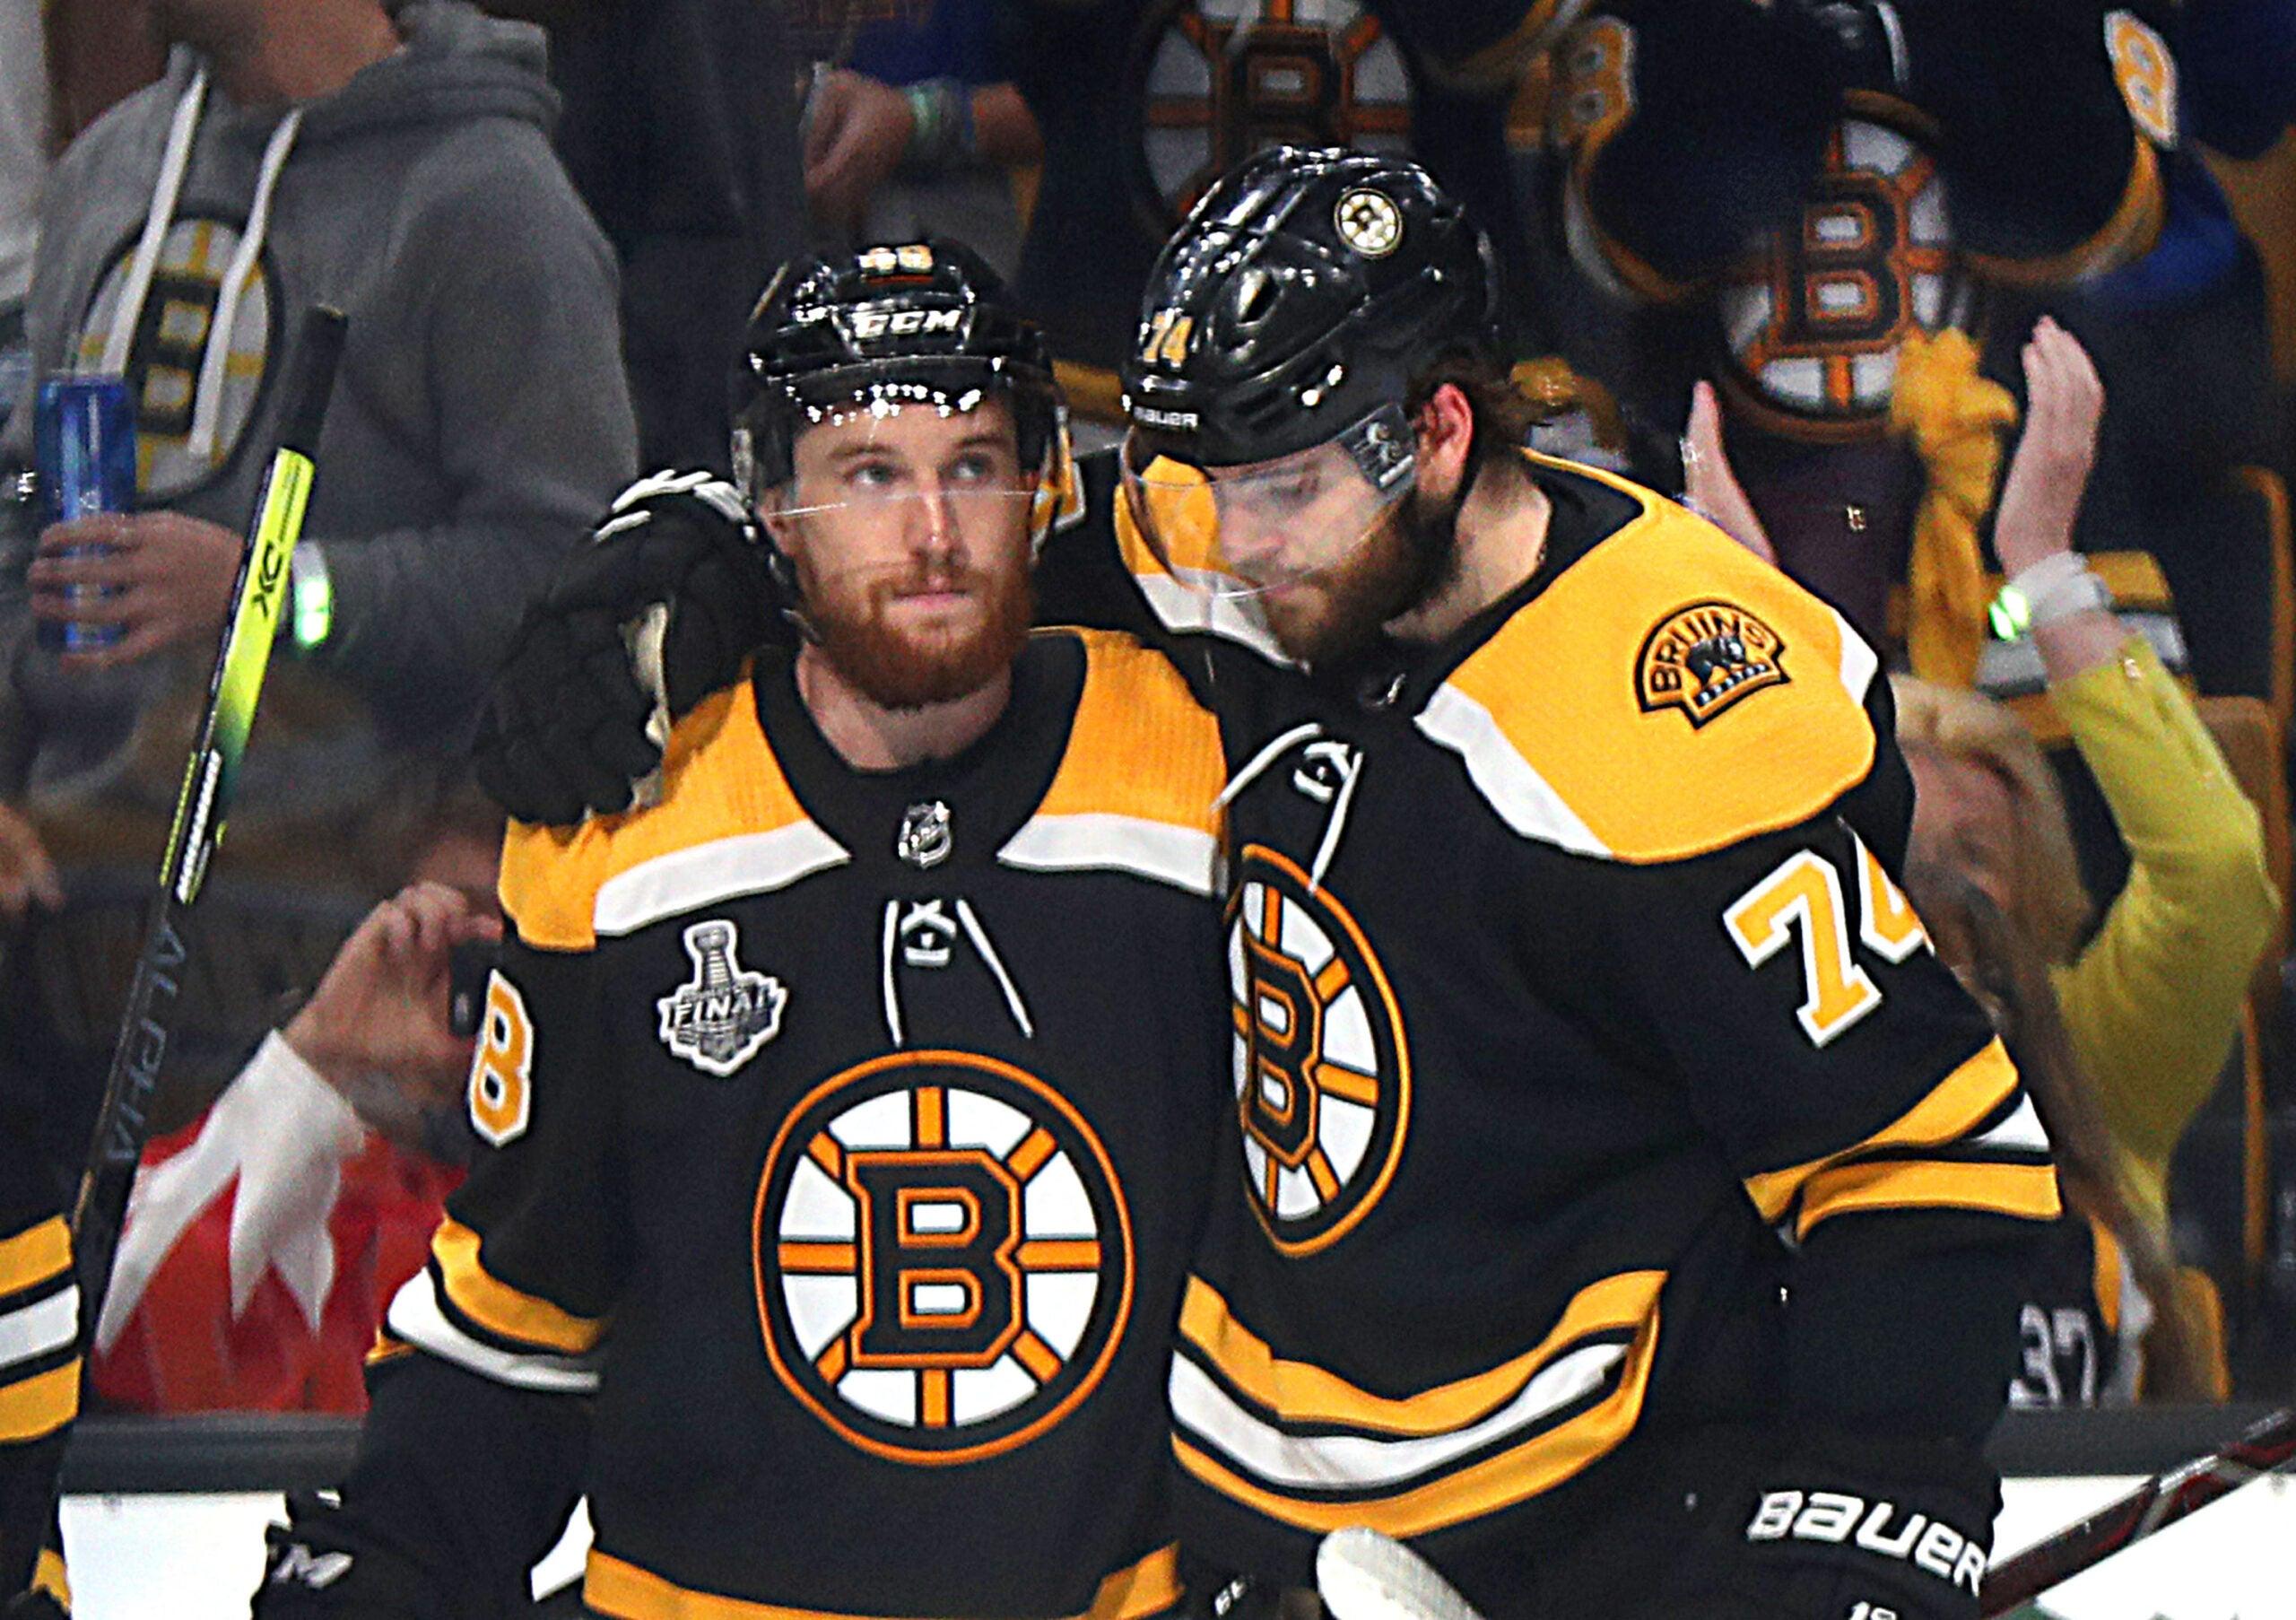 Matt Grzelcyk Jake DeBrusk Boston Bruins